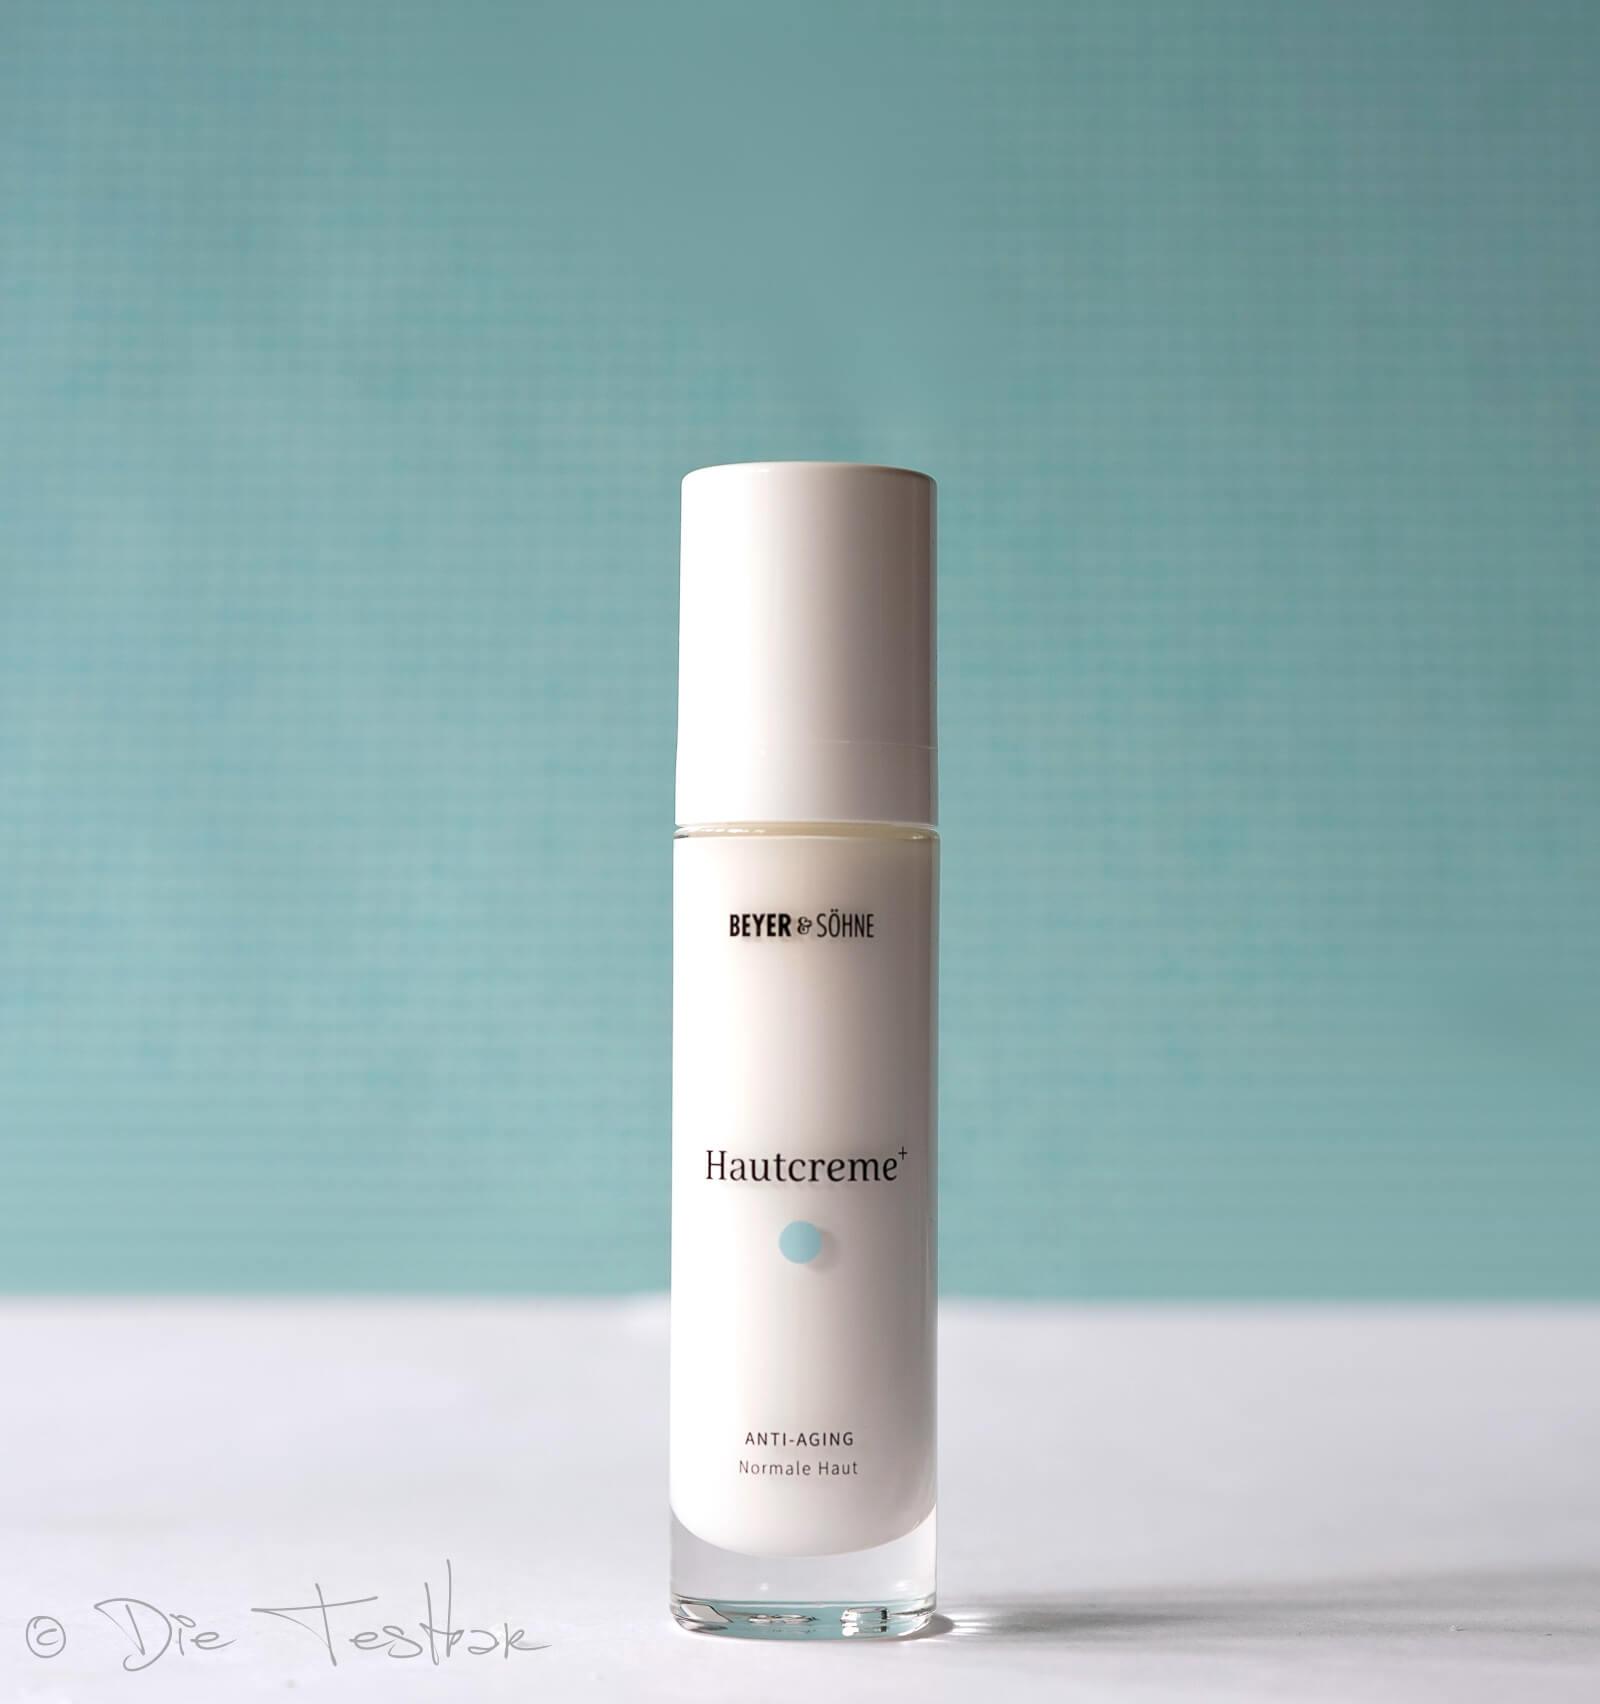 Hautcreme+ Anti‑Aging - Normale Haut